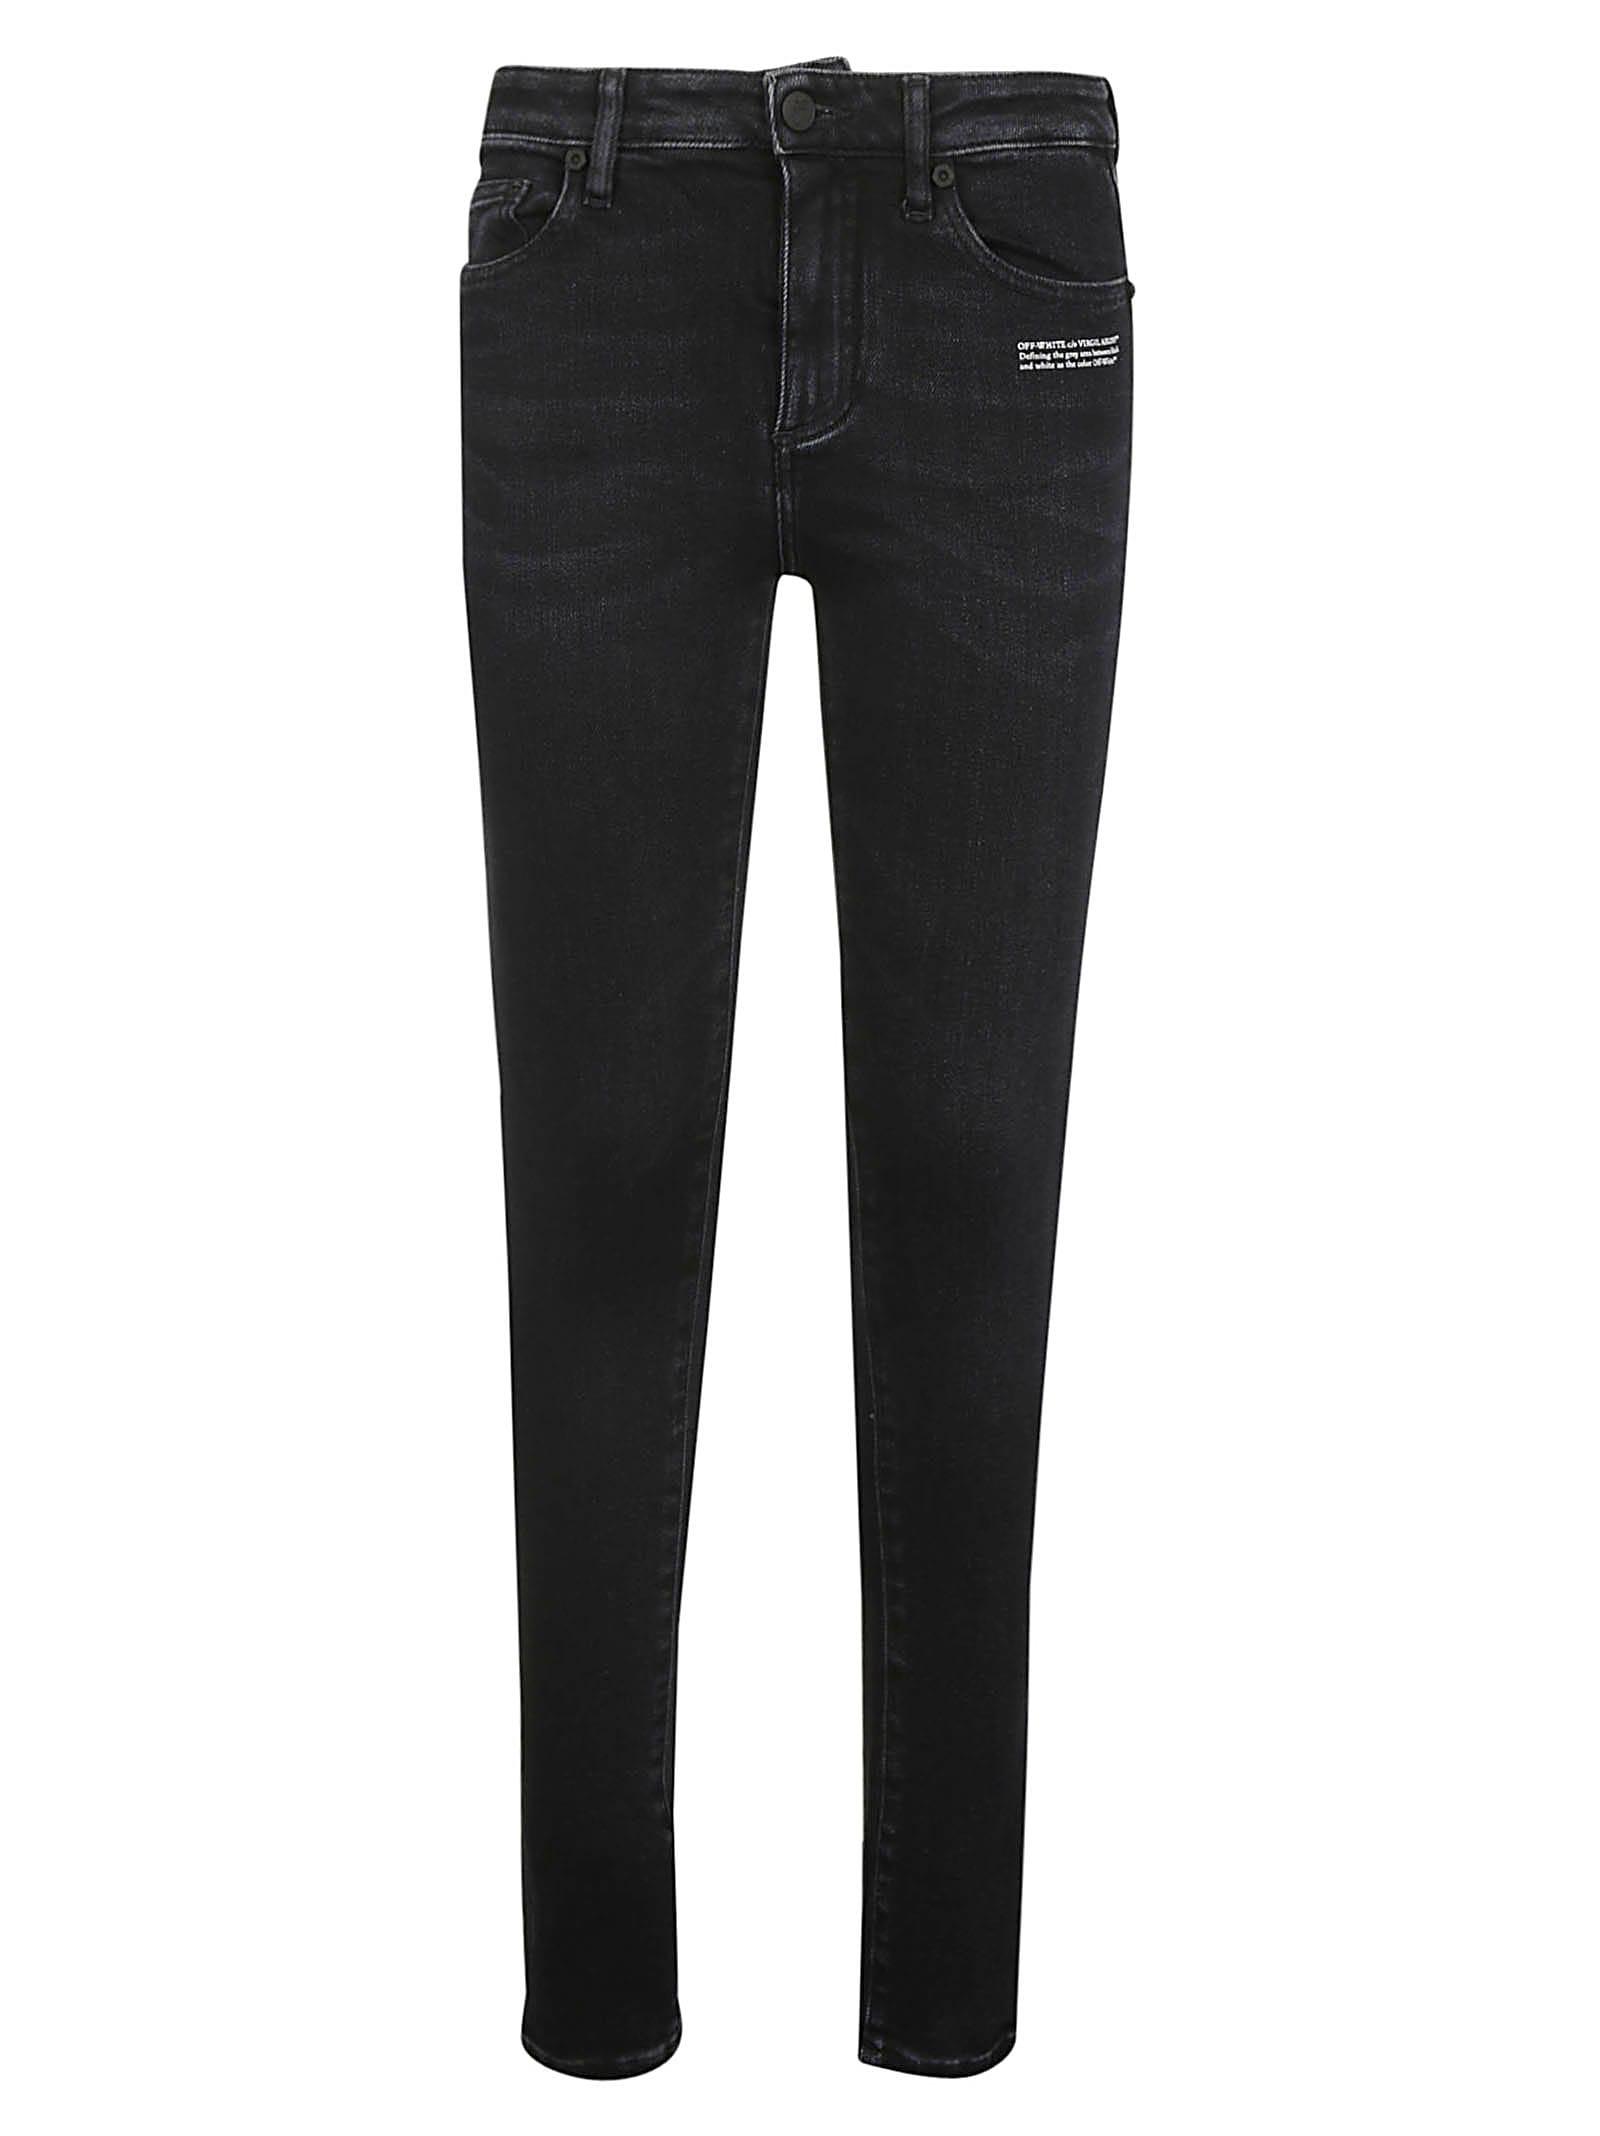 Off-White Denim Skinny Jeans